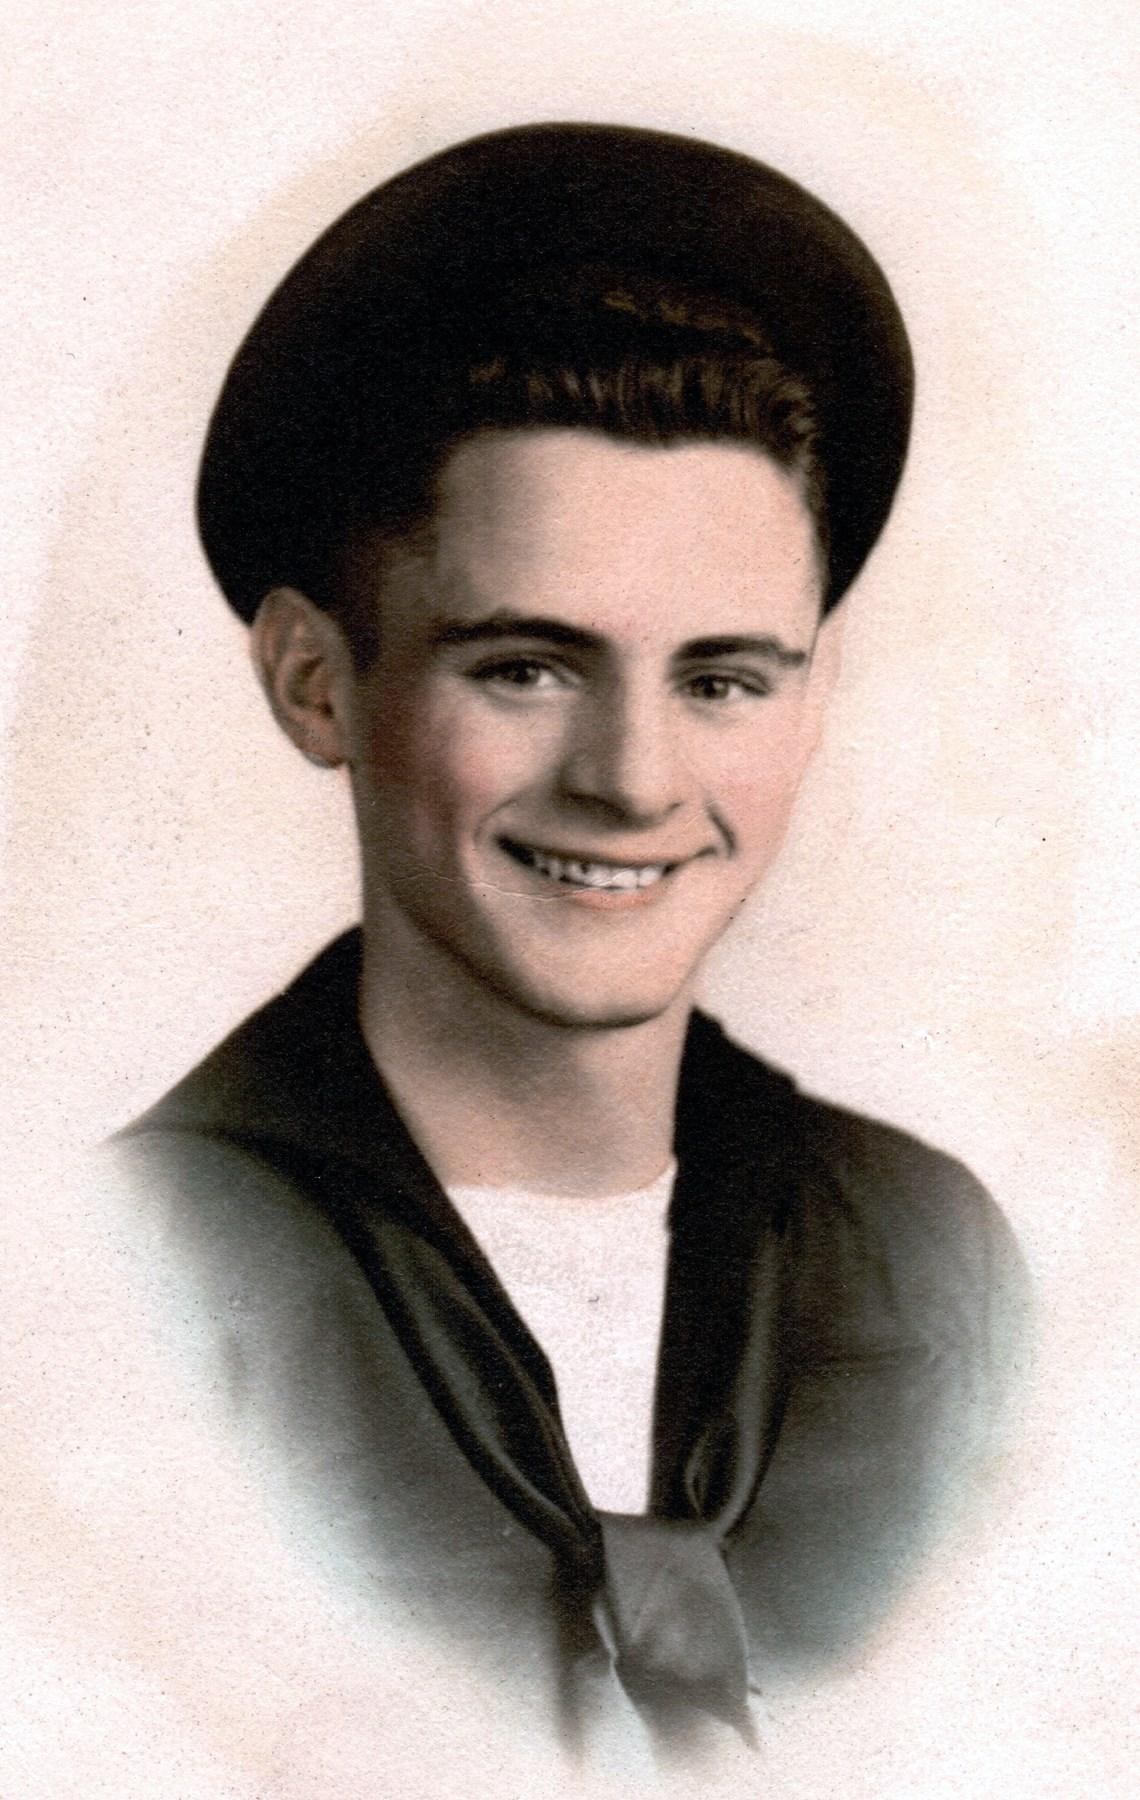 John Charles Zaccaria